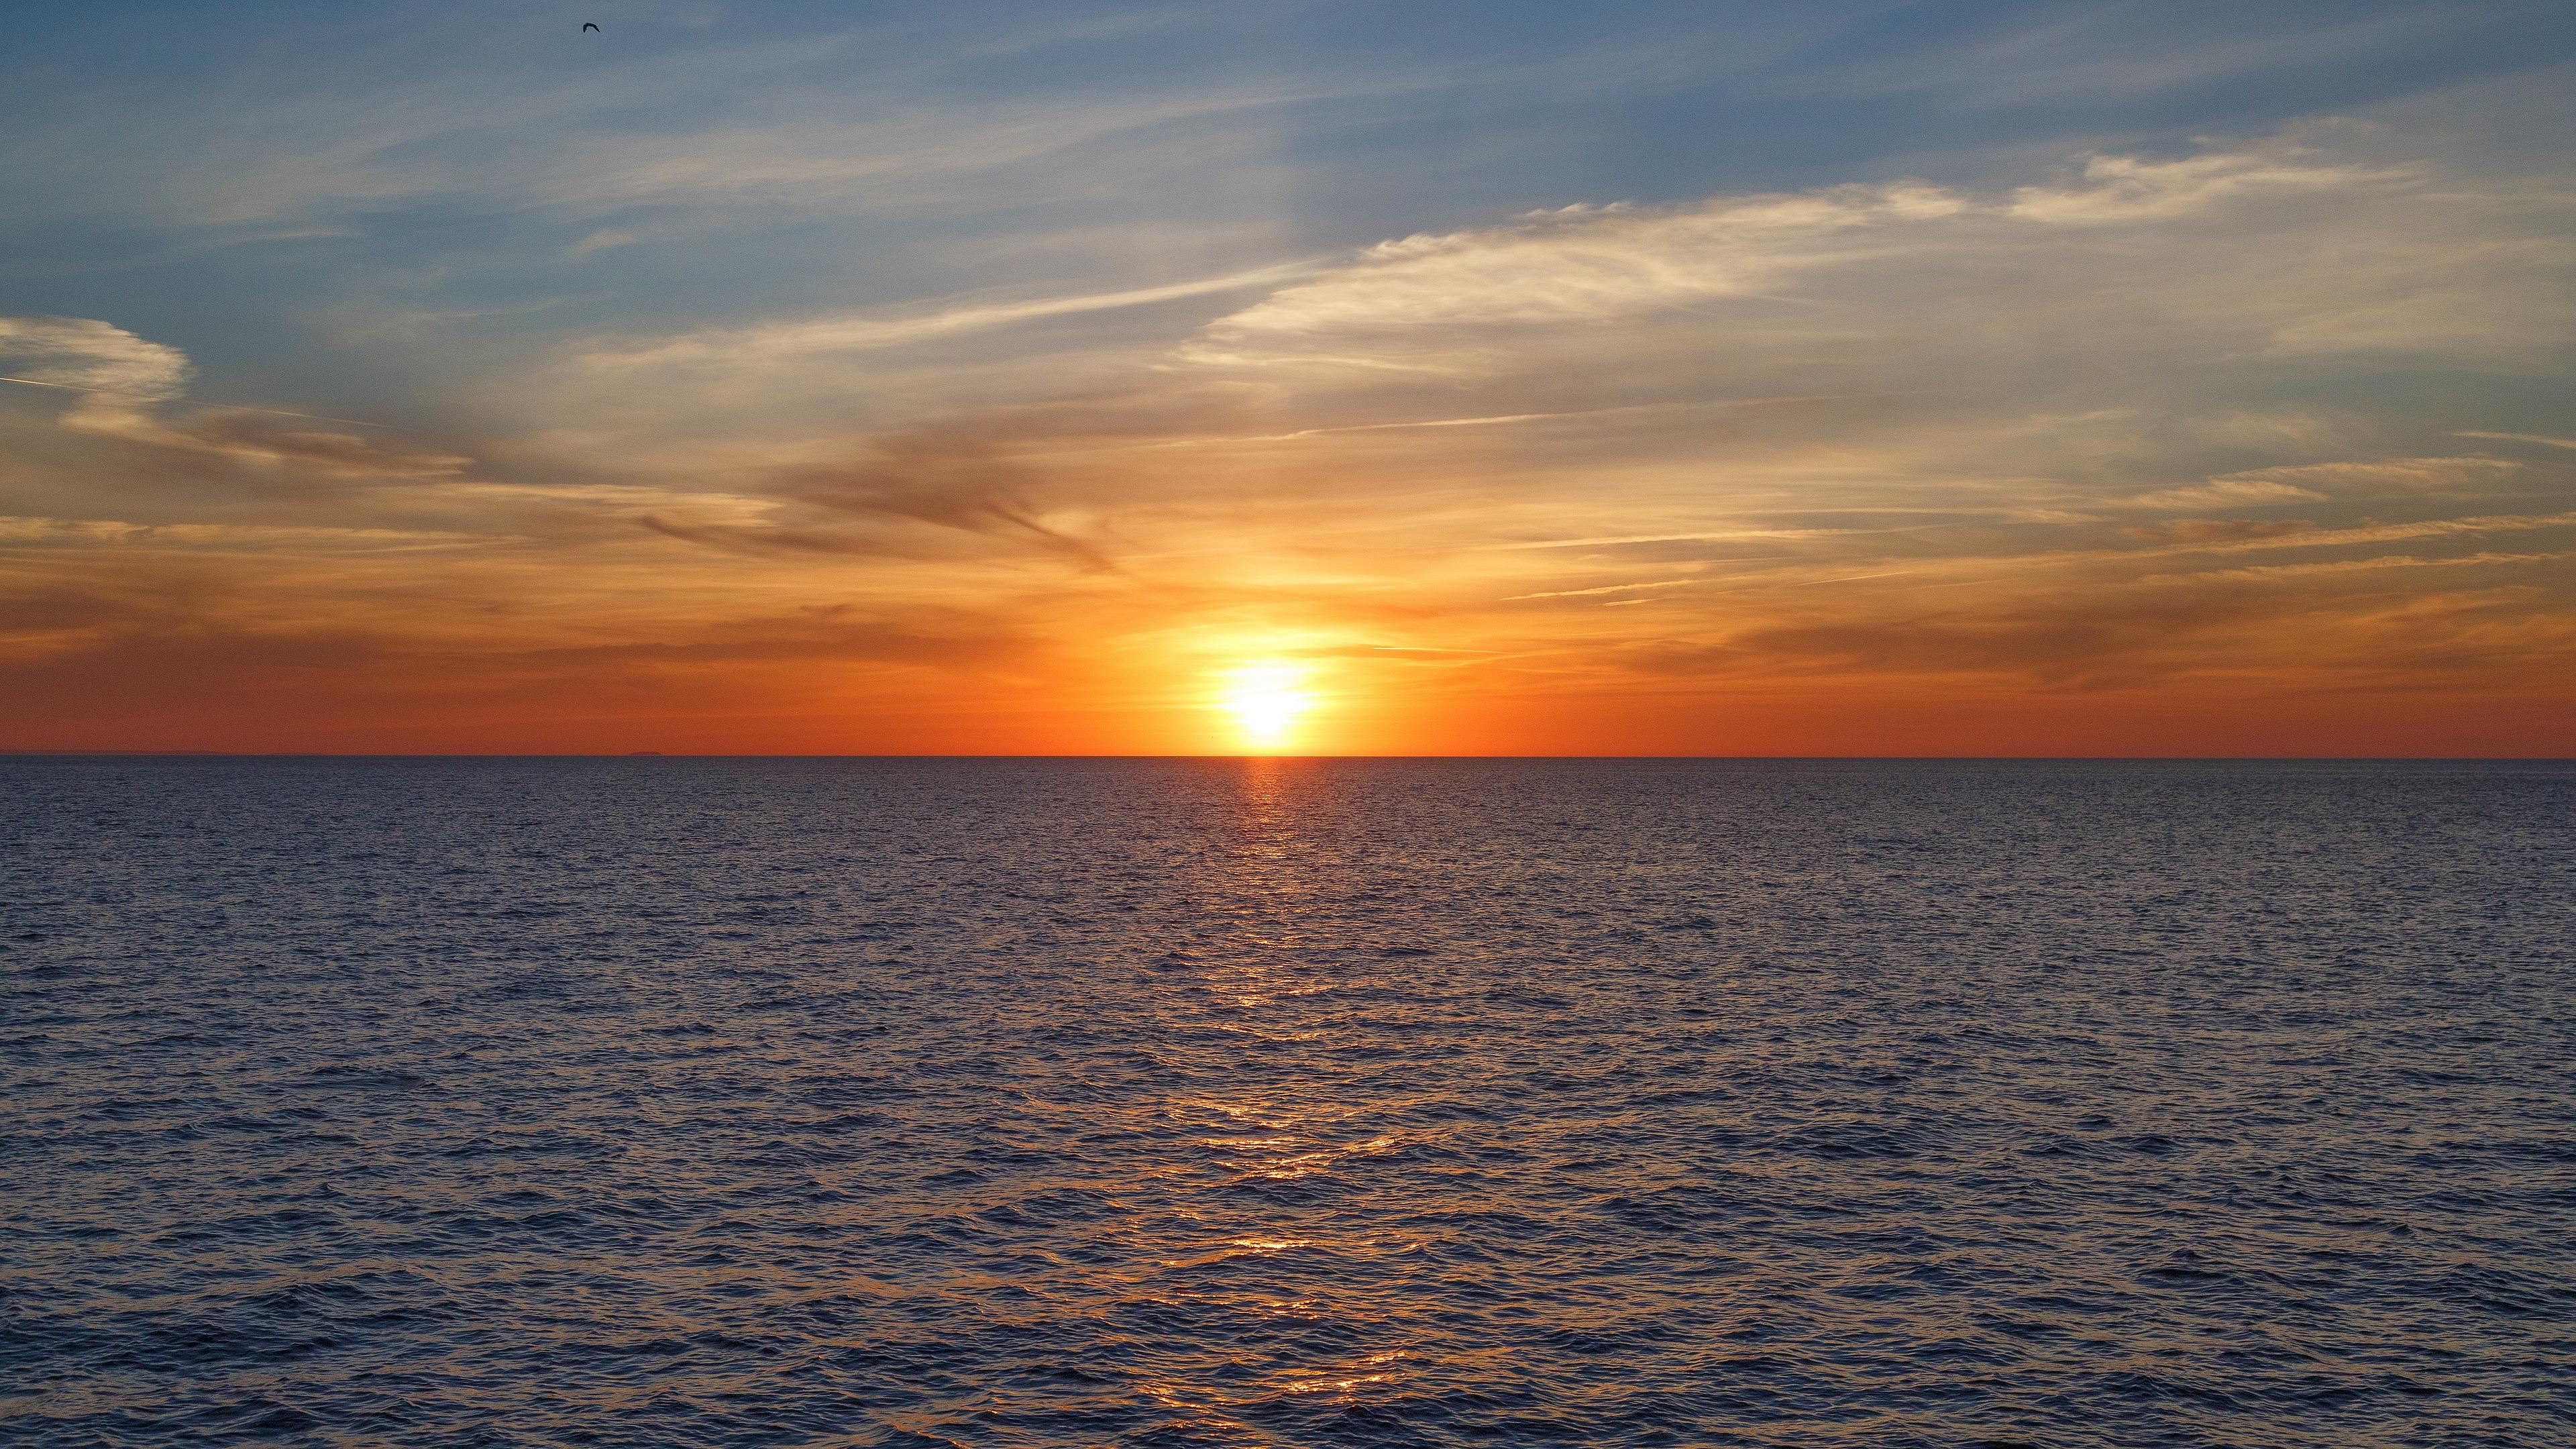 sunset sea sky clouds 4k 1541115240 - sunset, sea, sky, clouds 4k - sunset, Sky, Sea